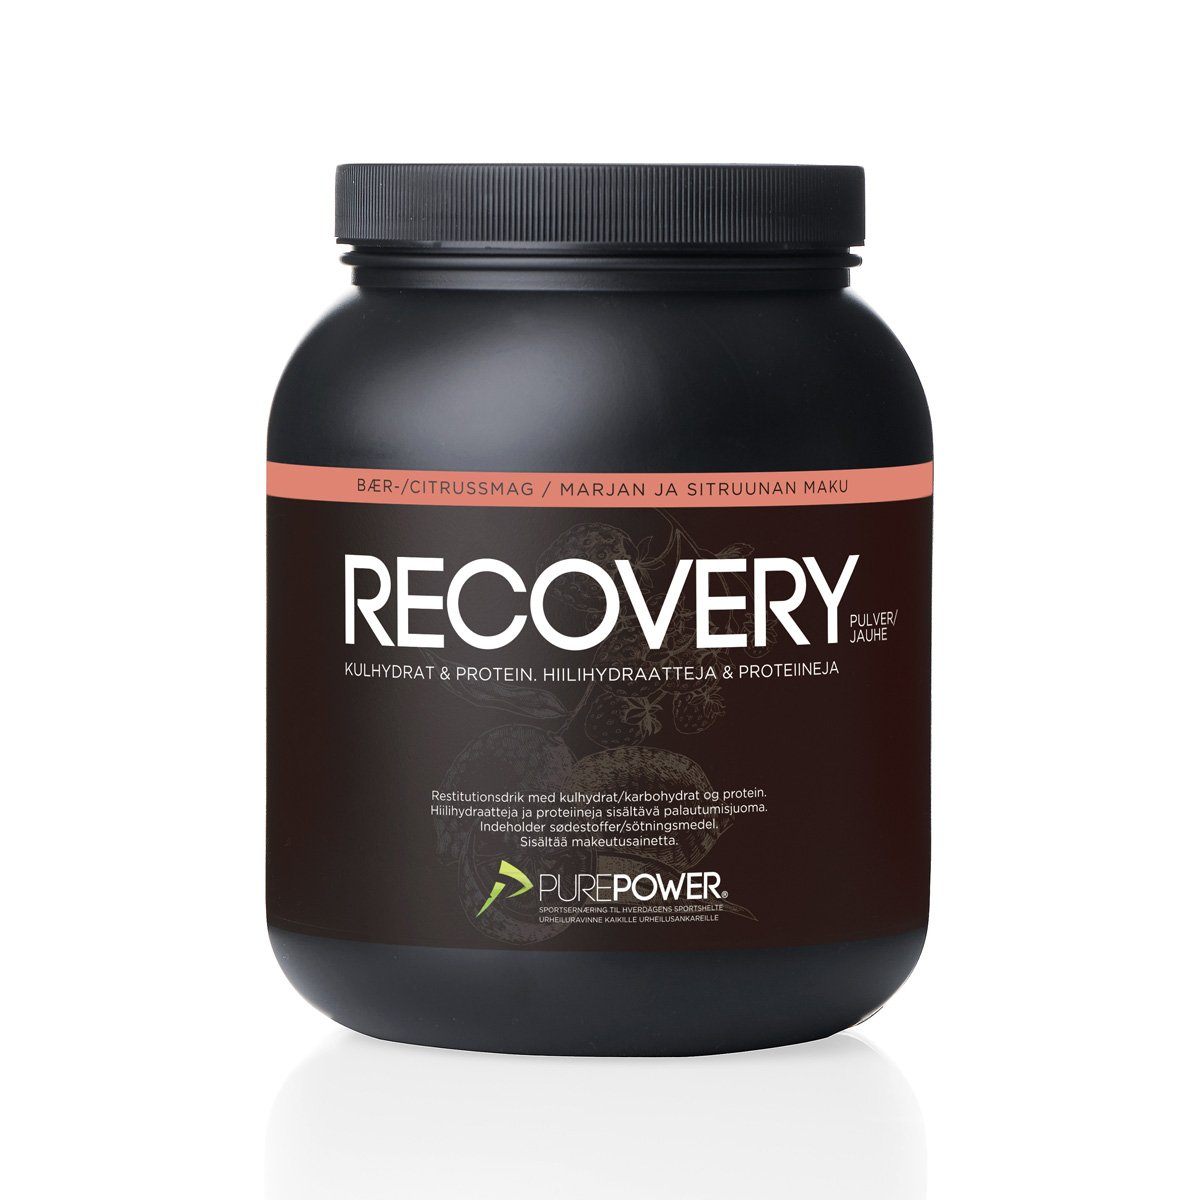 PurePower Recovery Bær/Citrus 1.6 kg   item_misc